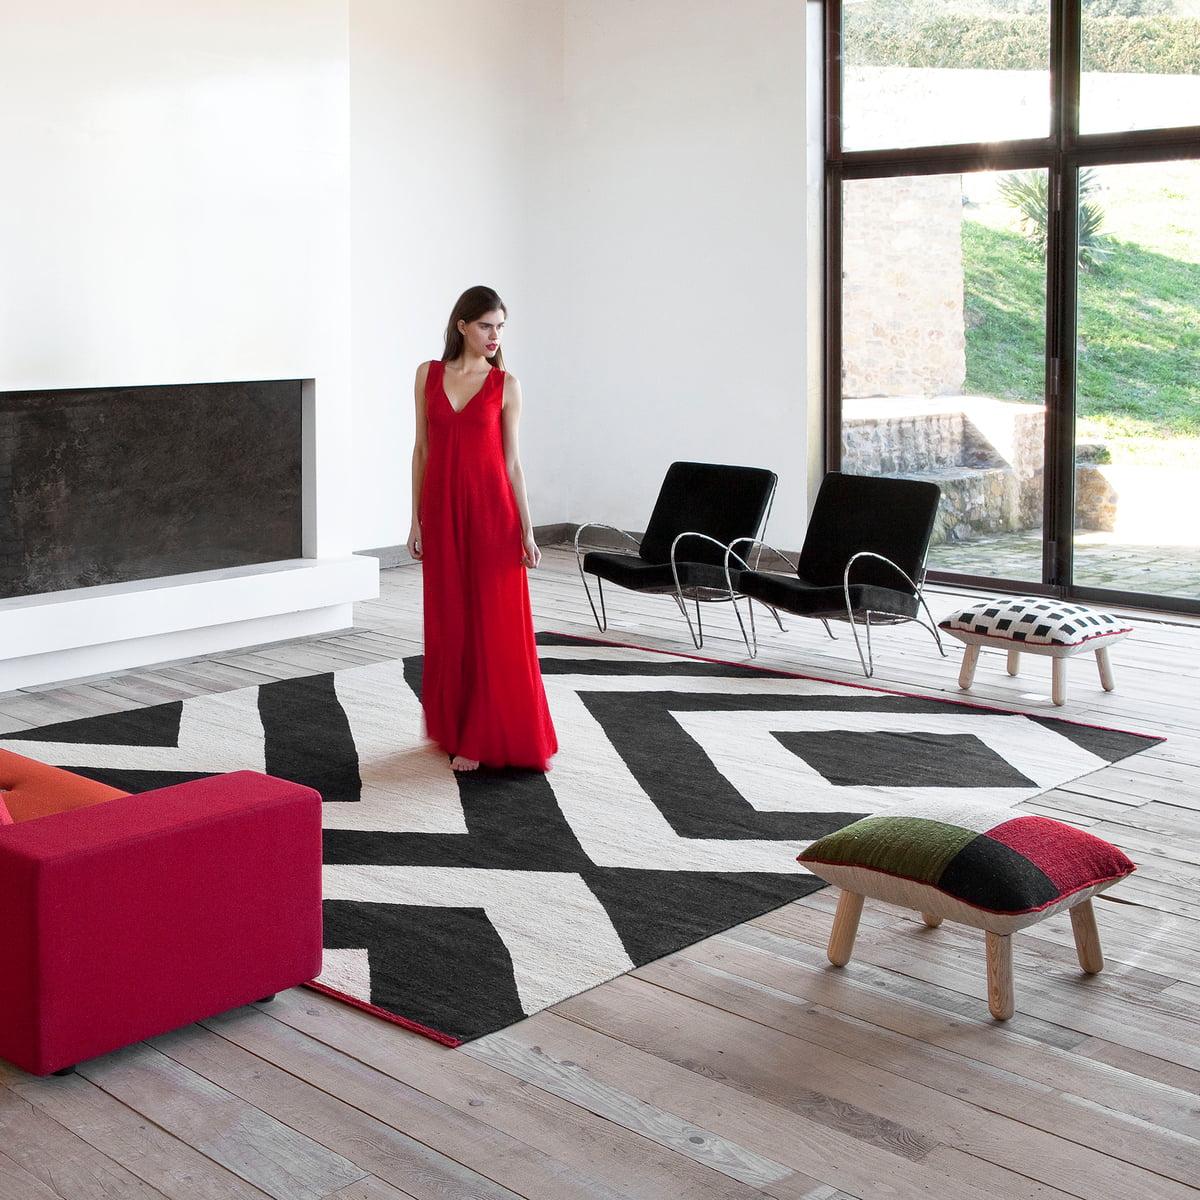 mélange zoom rug by nanimarquina - mélange rug and pouf by nanimarquina